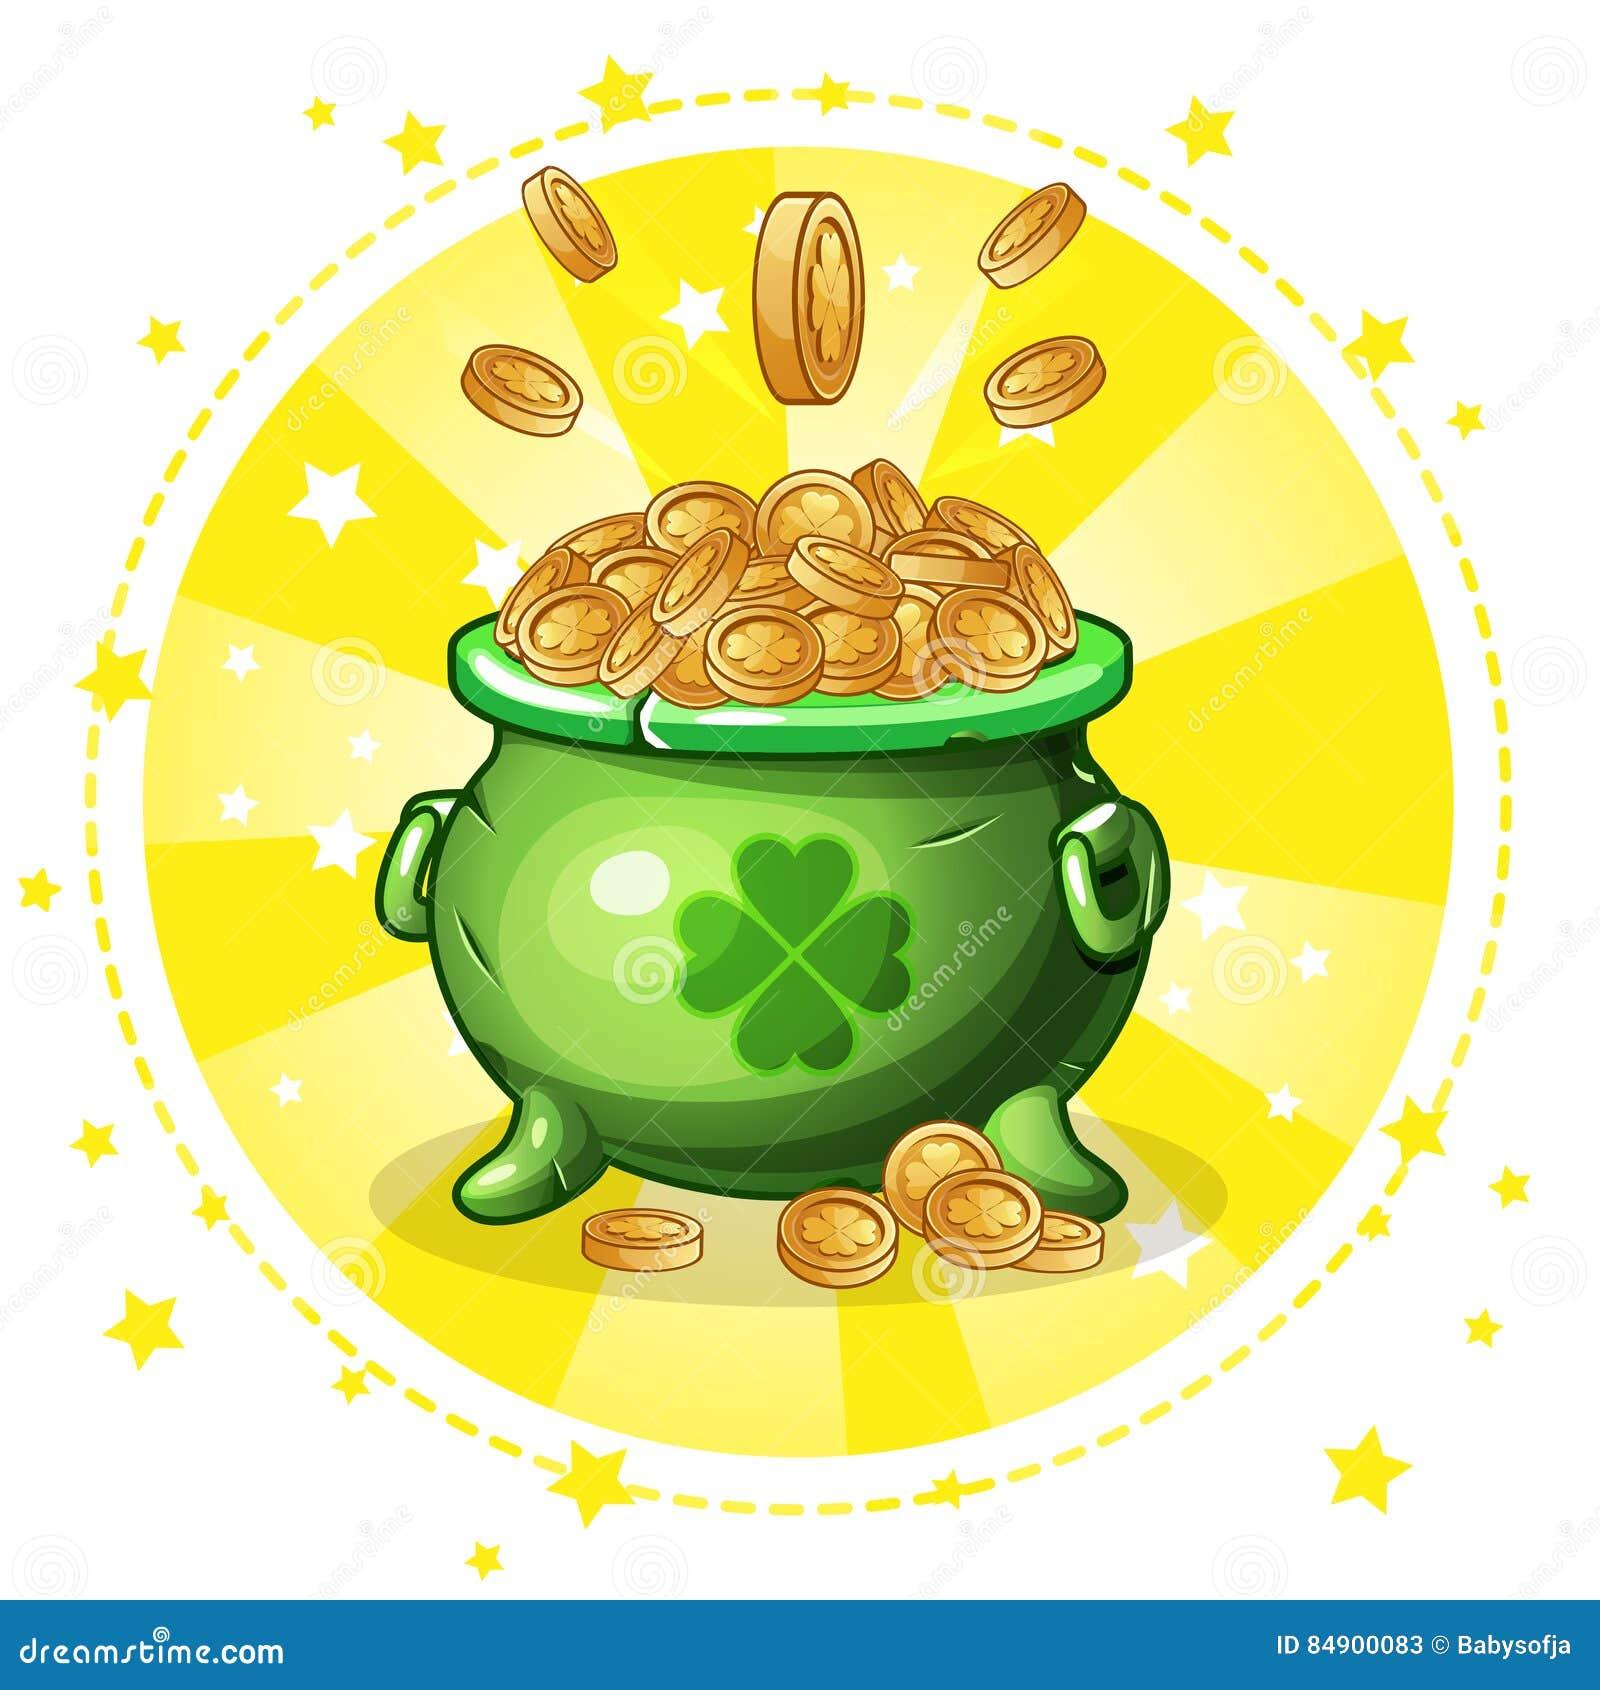 Cartoon Green Pot Of Gold Coins Stock Vector - Image: 84900083